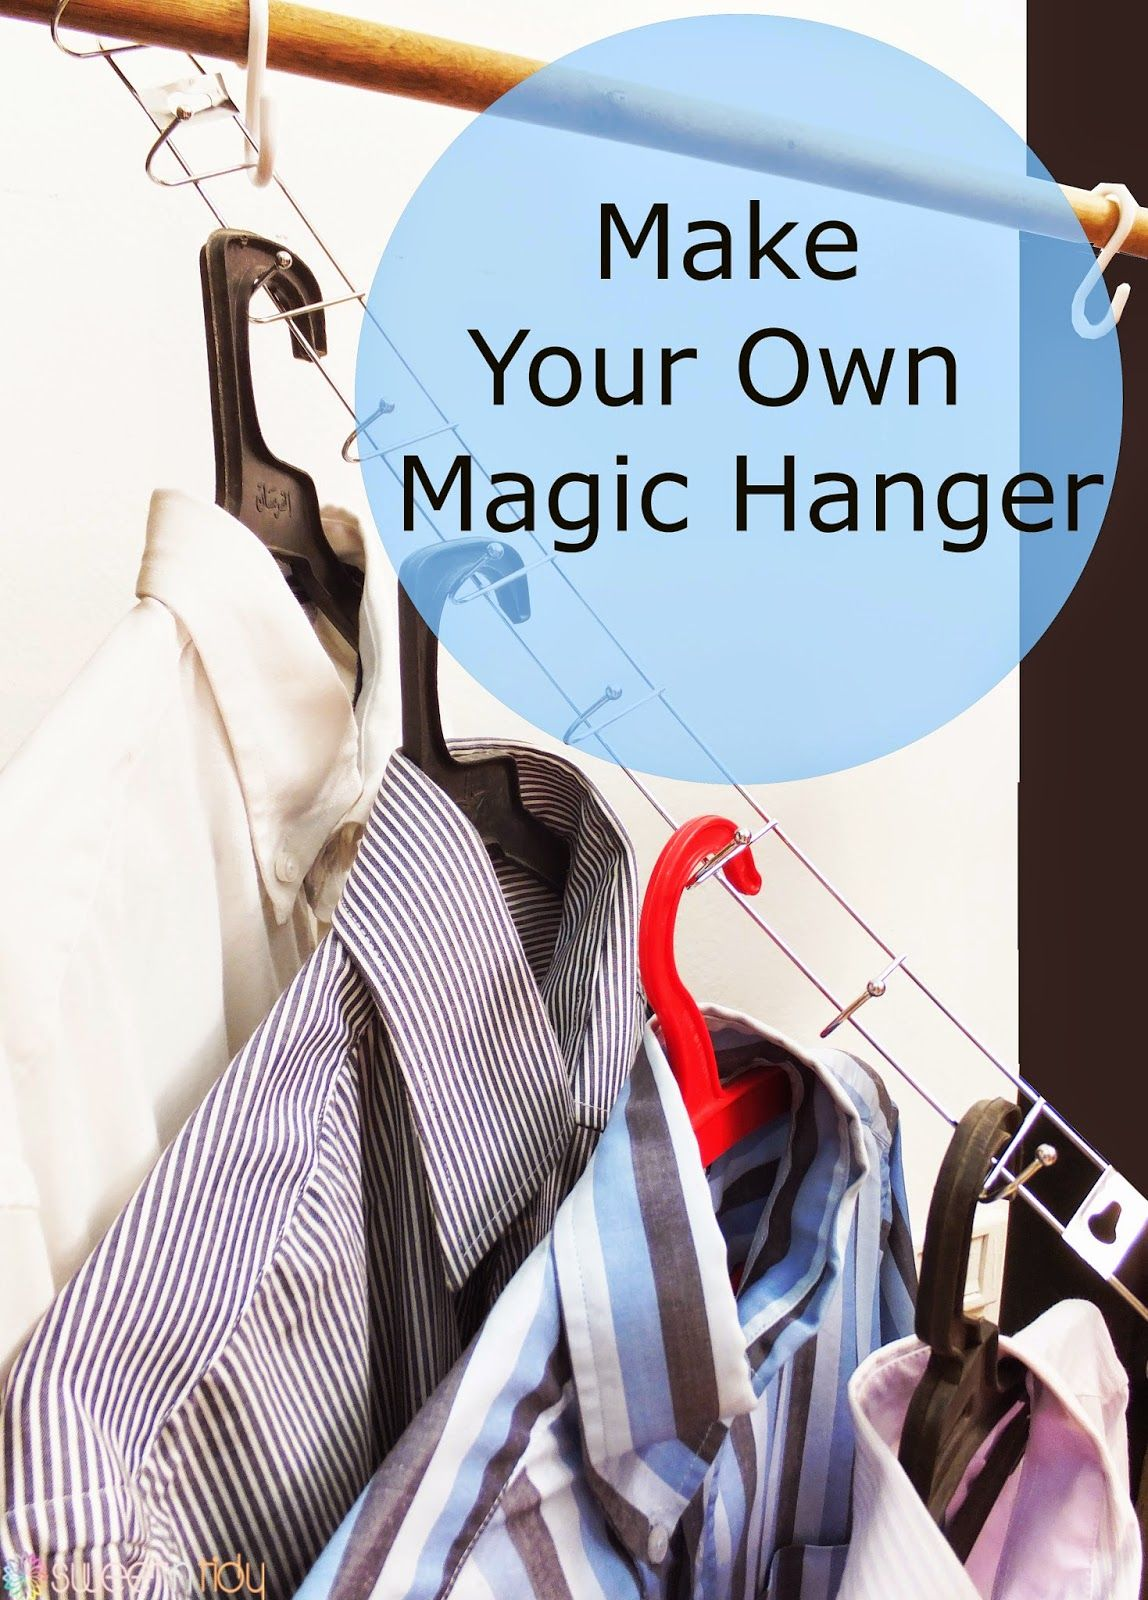 Make Your Own Magic Hanger